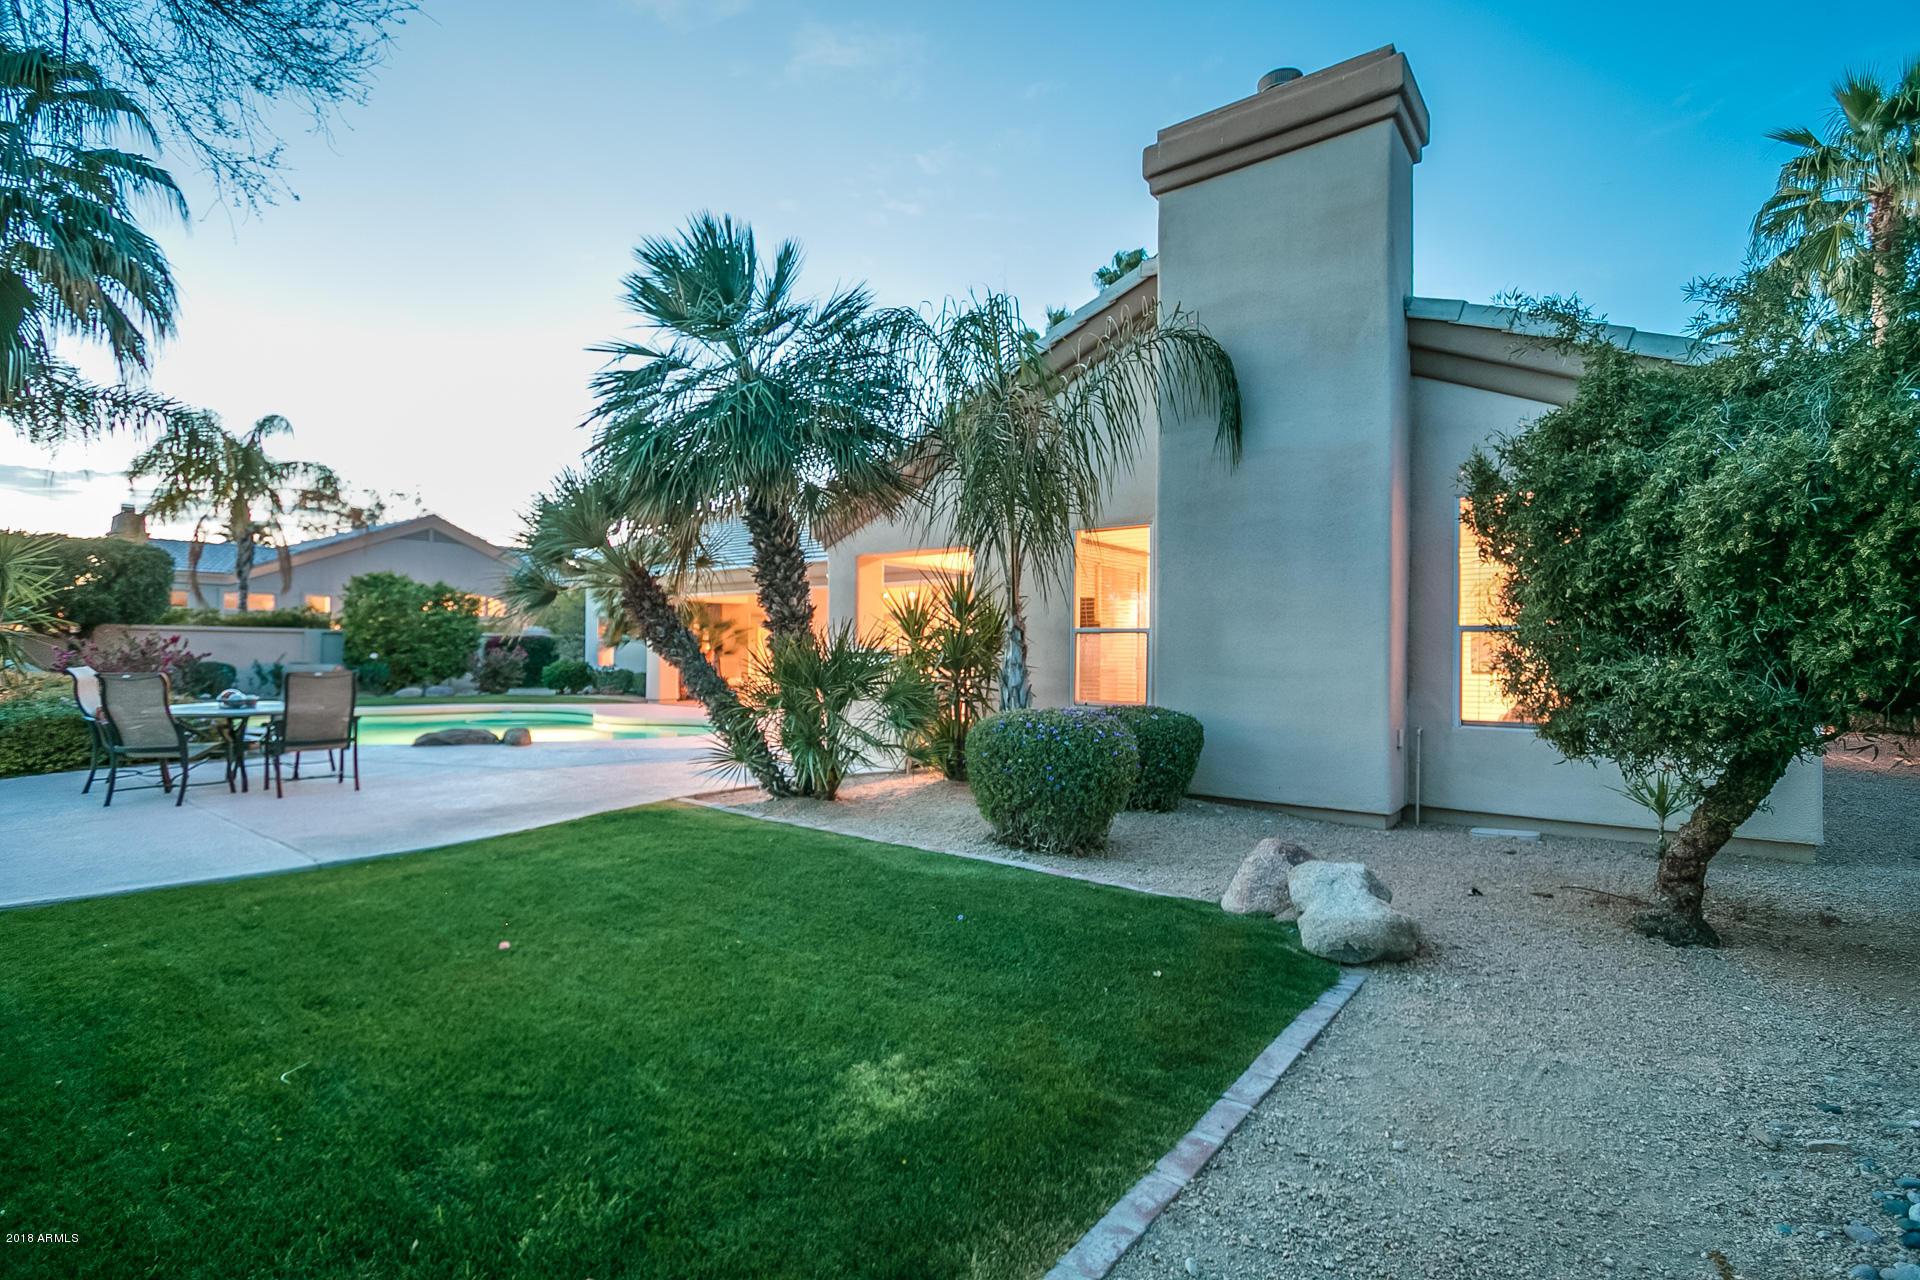 MLS 5740411 9227 N 113th Way, Scottsdale, AZ 85259 Scottsdale AZ Stonegate